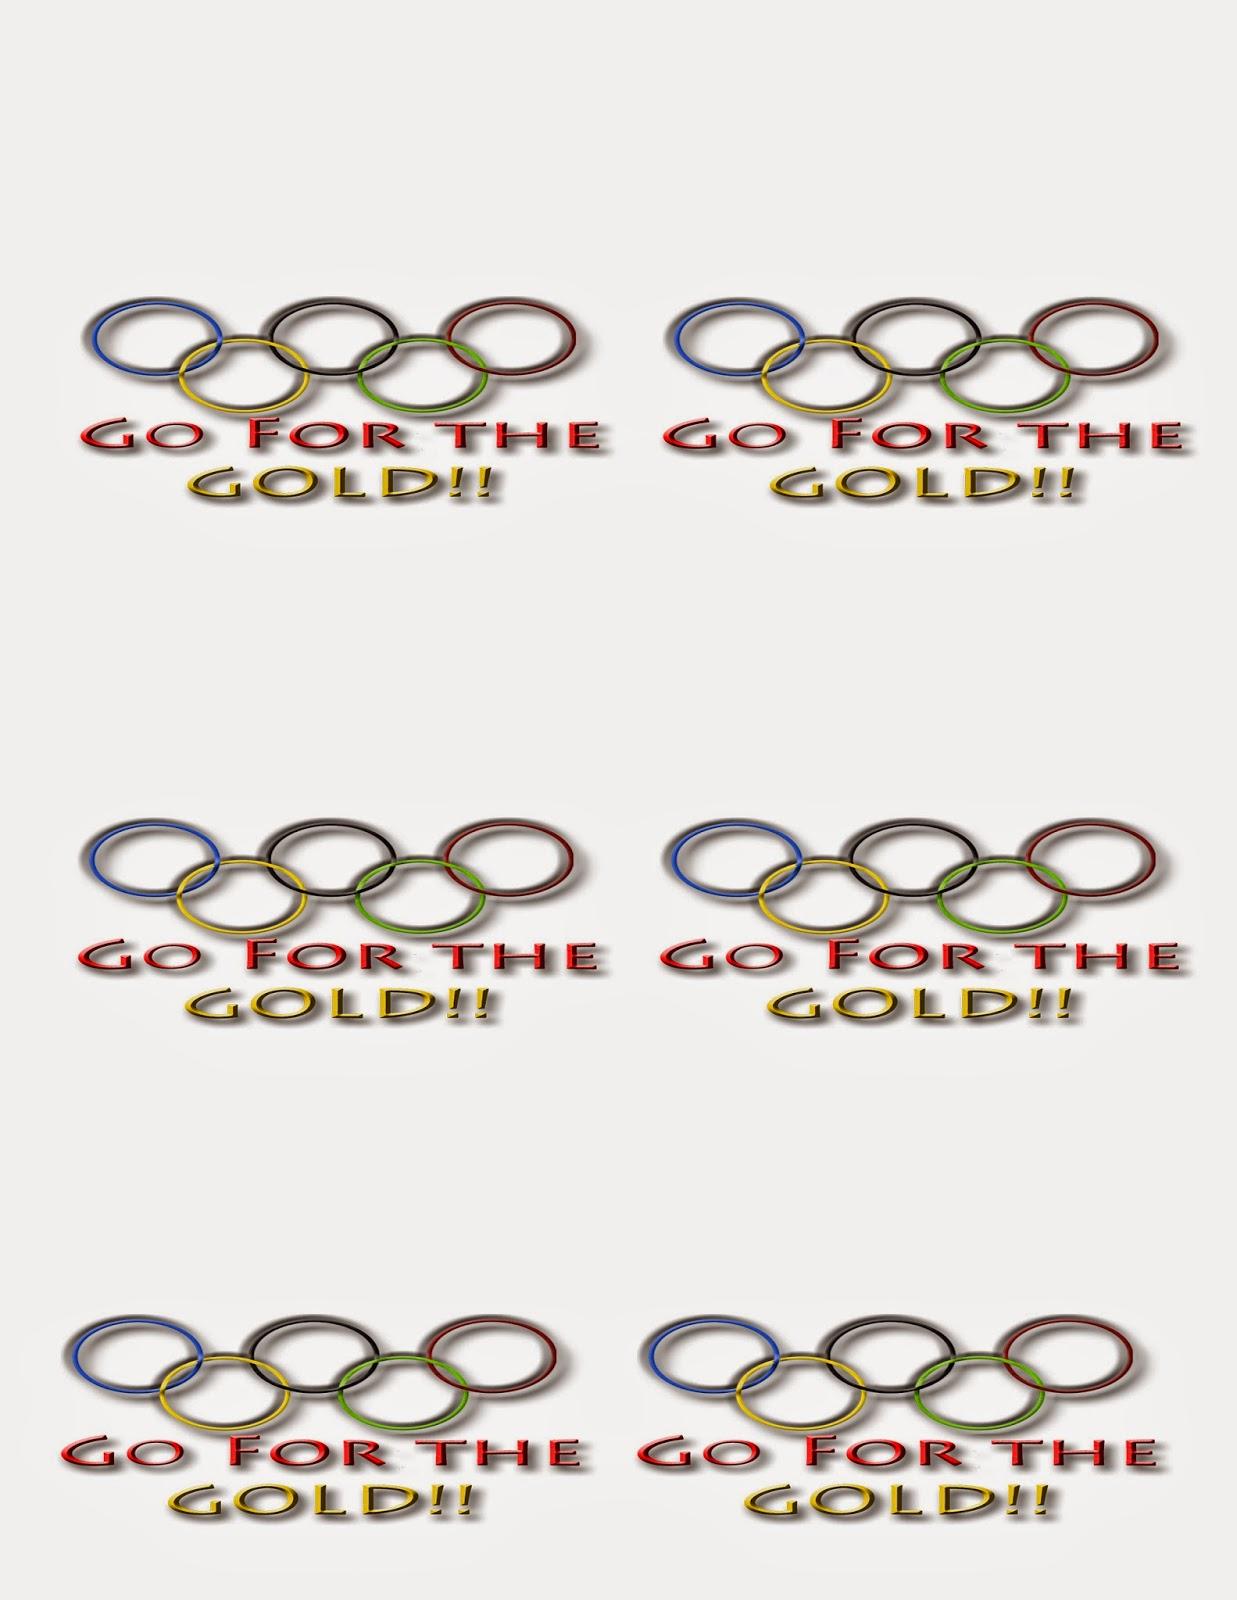 http://www.4shared.com/download/2ivkfev7ba/Go_for_the_gold_labels.jpg?lgfp=3000